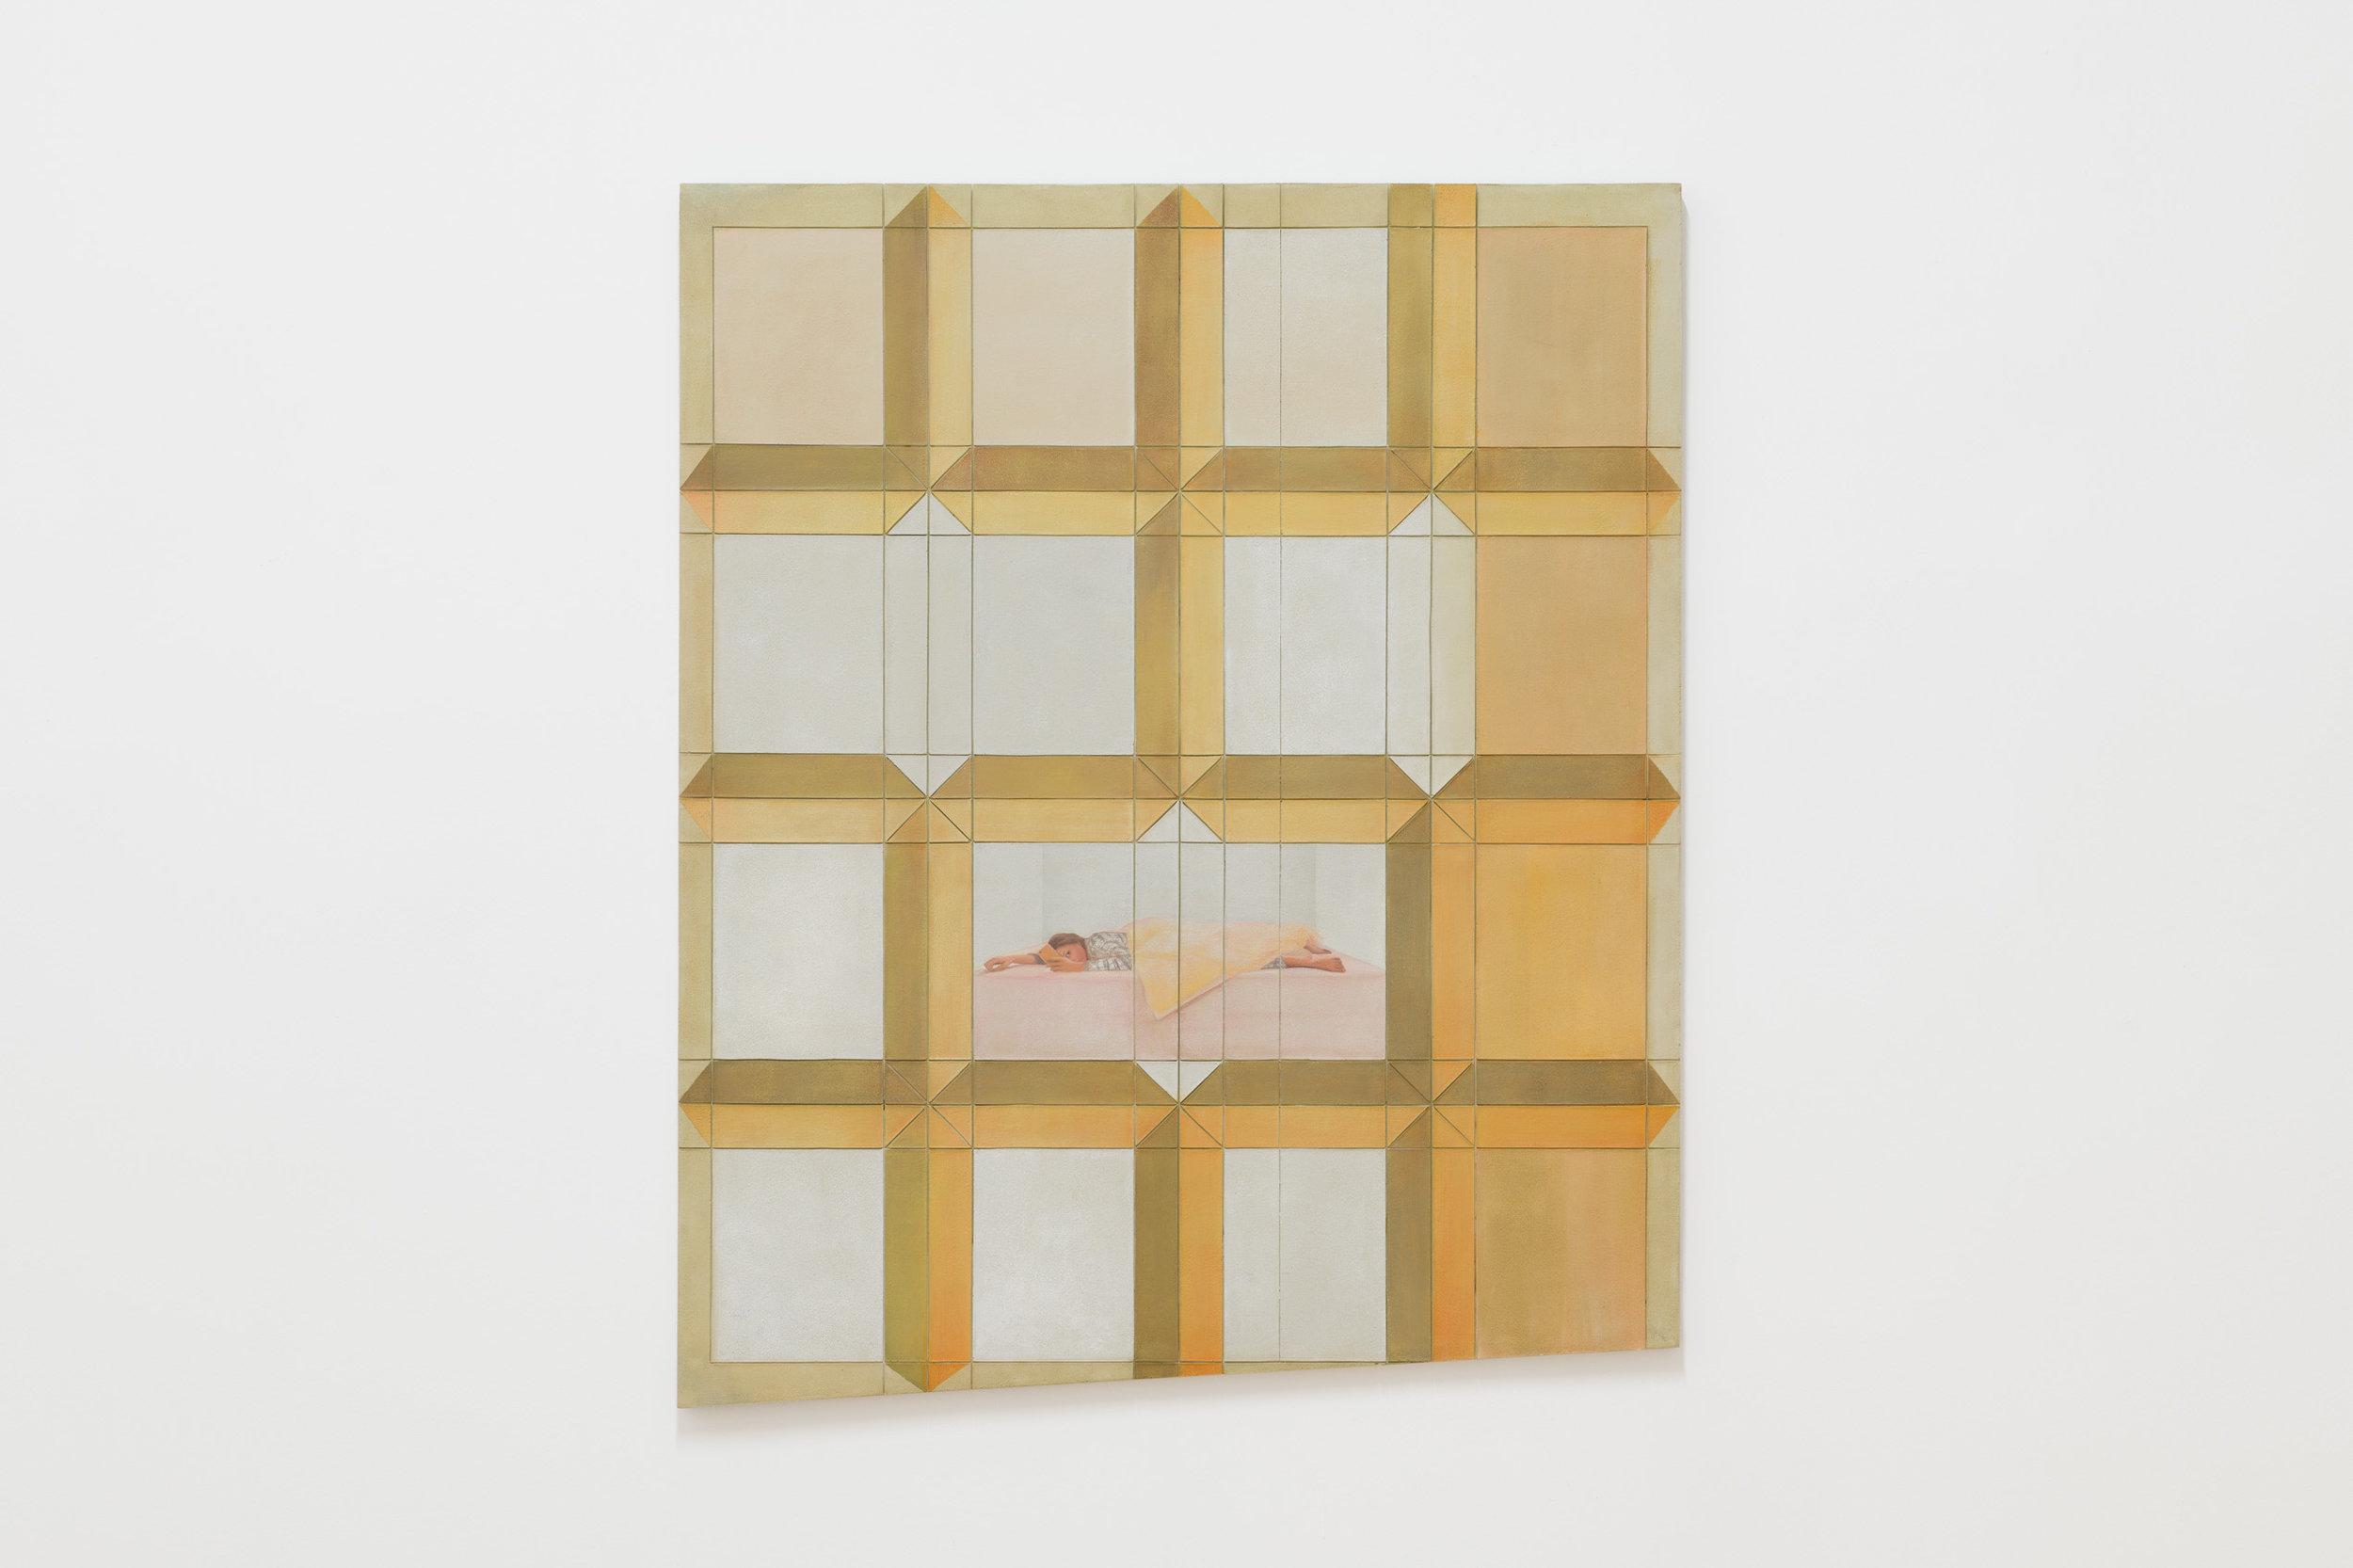 Melanie Ebenhoch, Interlude with Sunrise, 2018